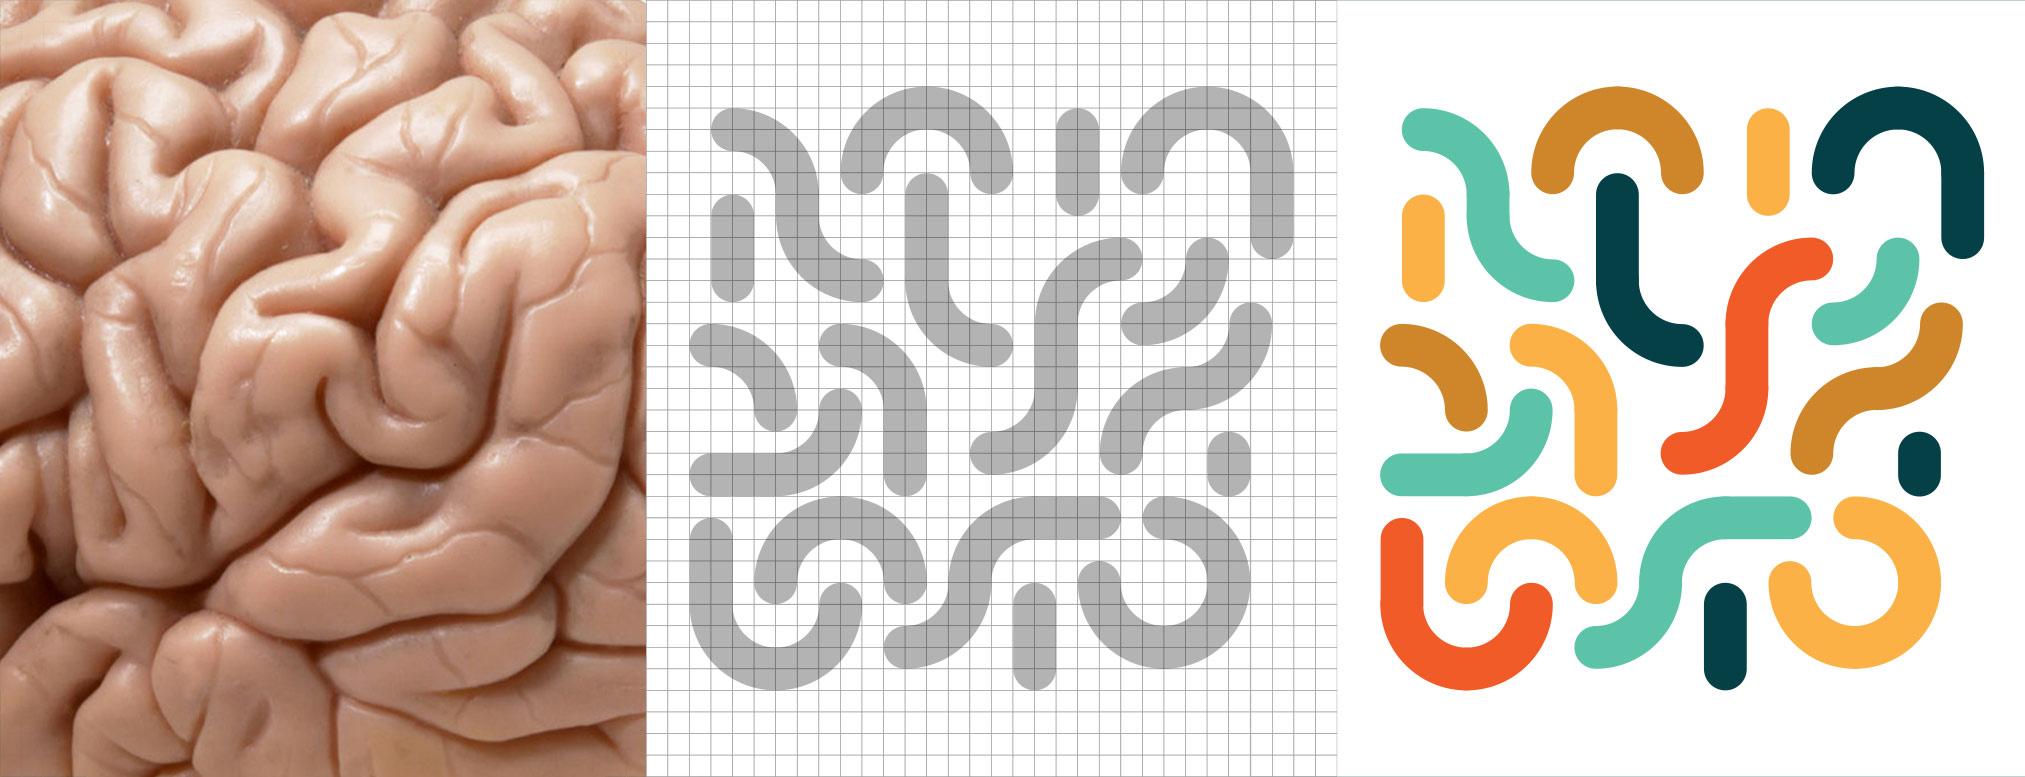 Tramas creadas en base al cerebro